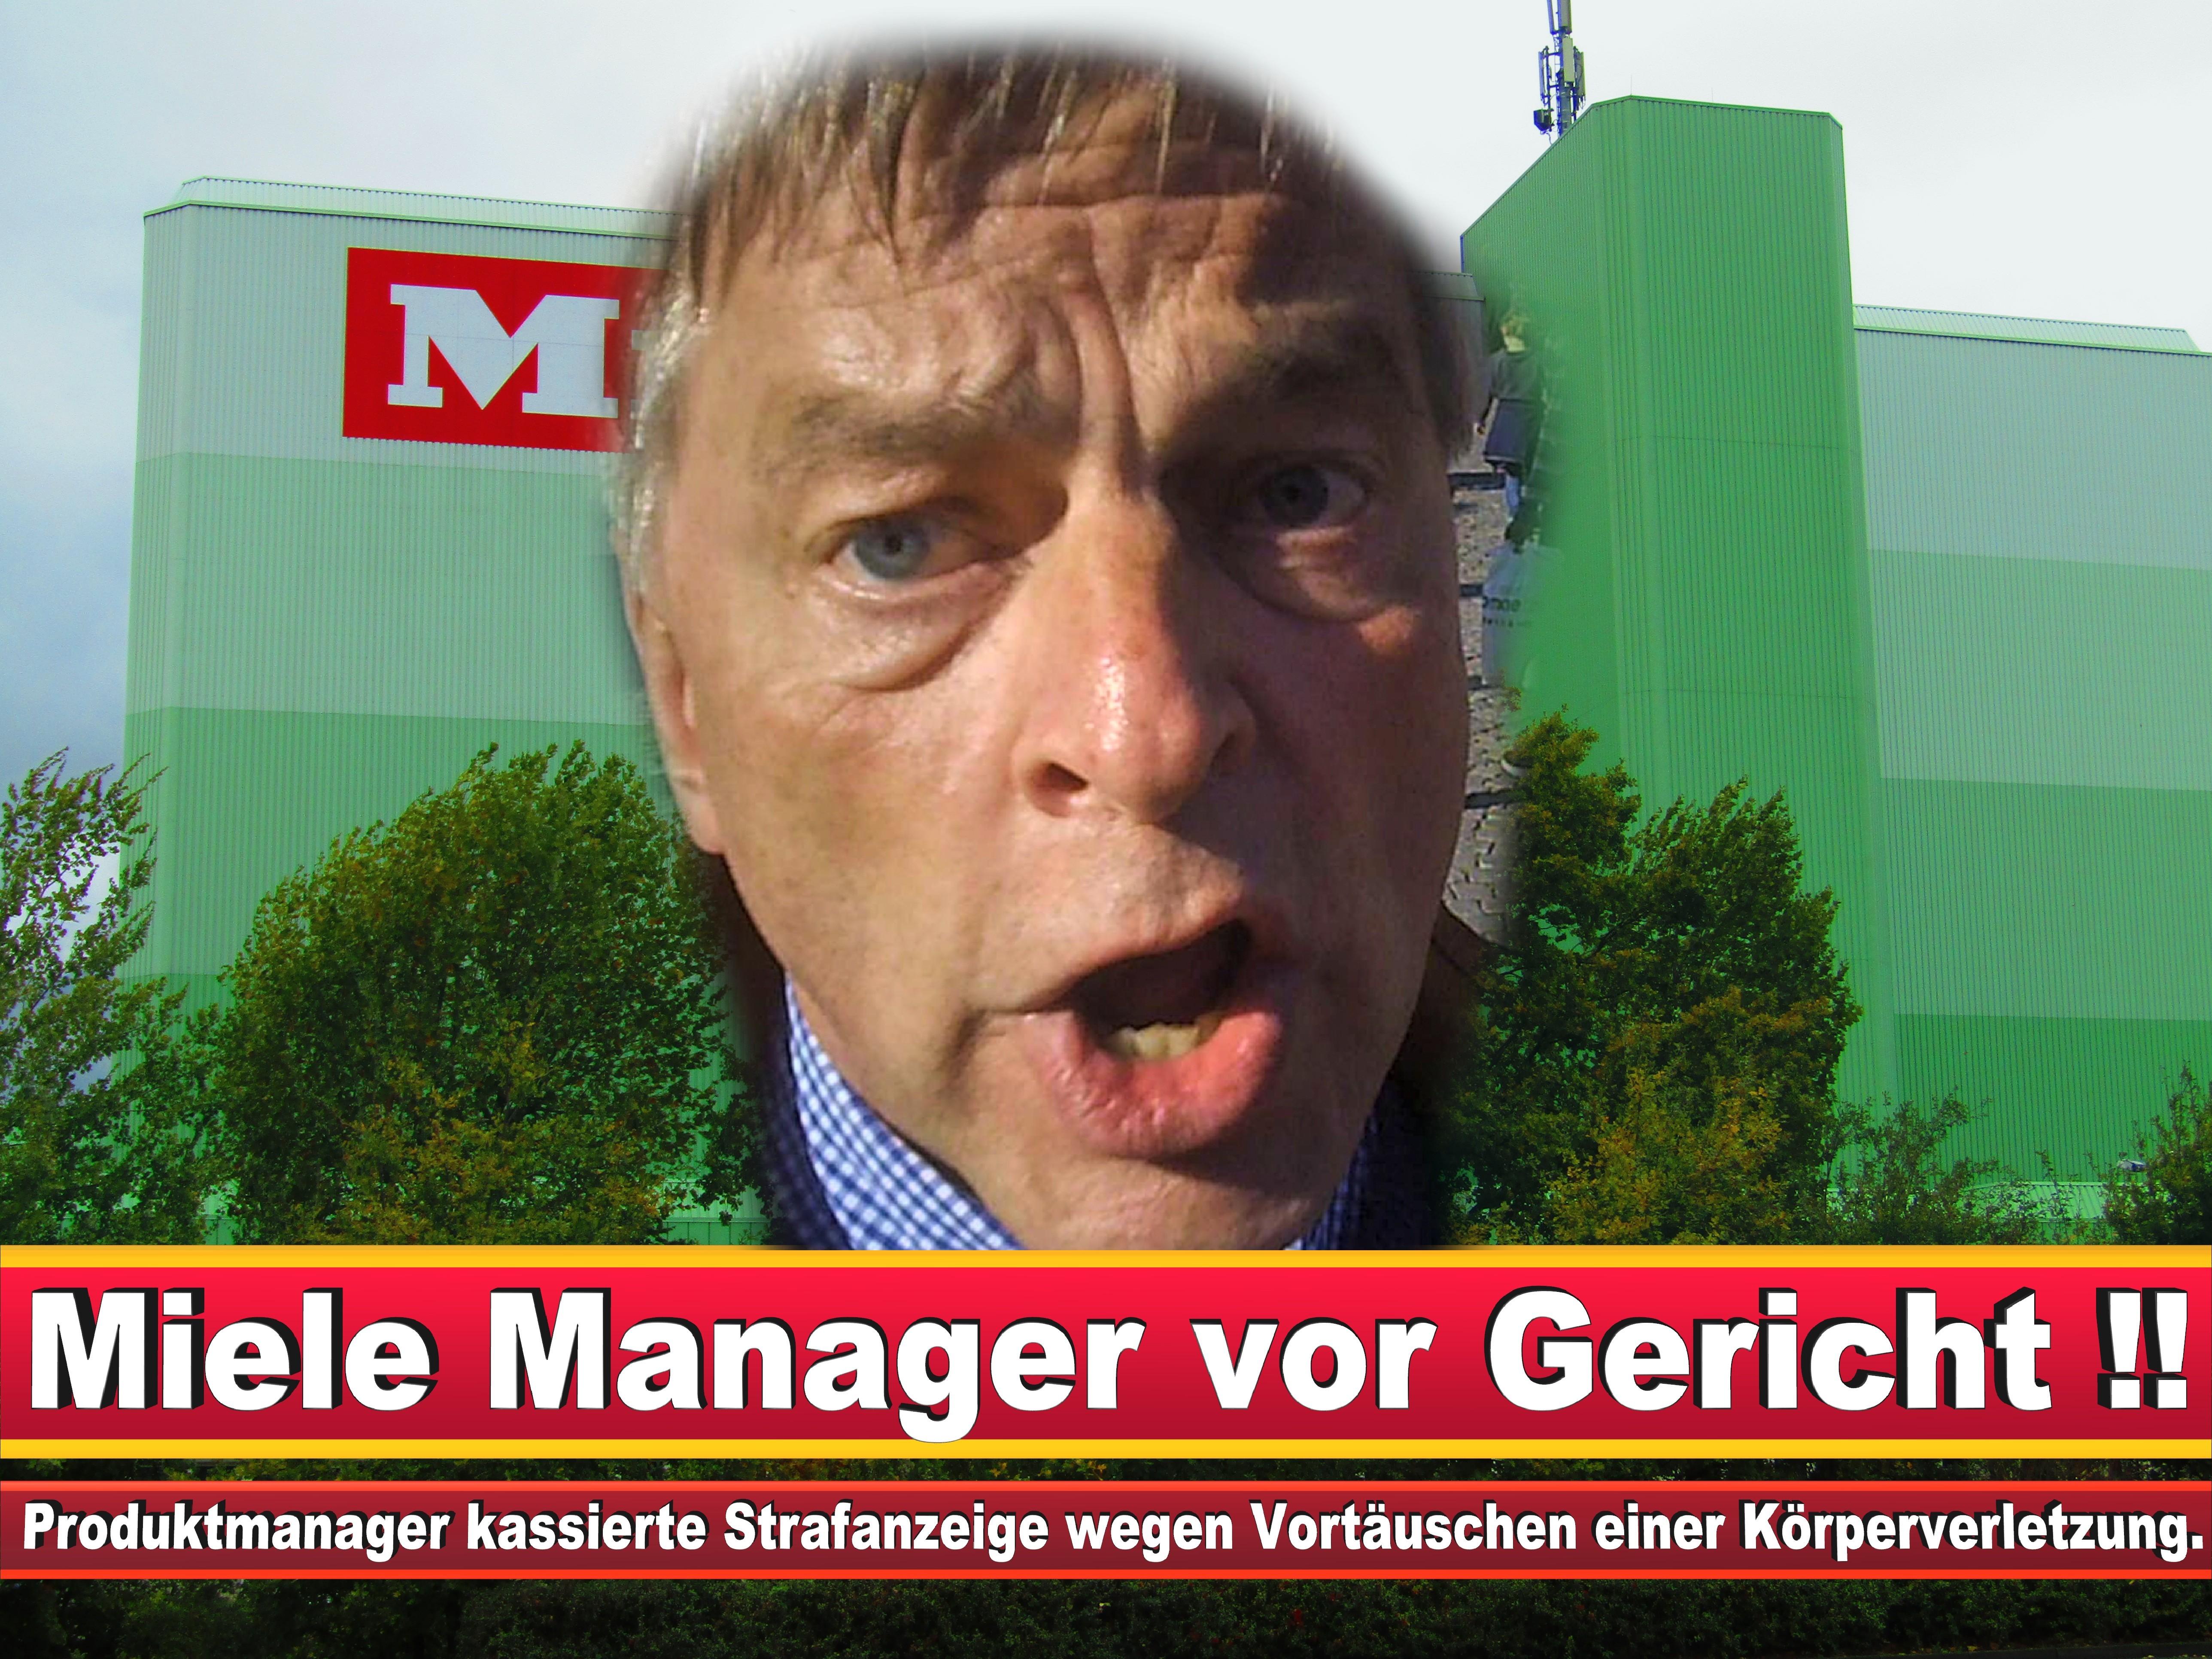 MIELE GÜTERSLOH IMPRESSUM